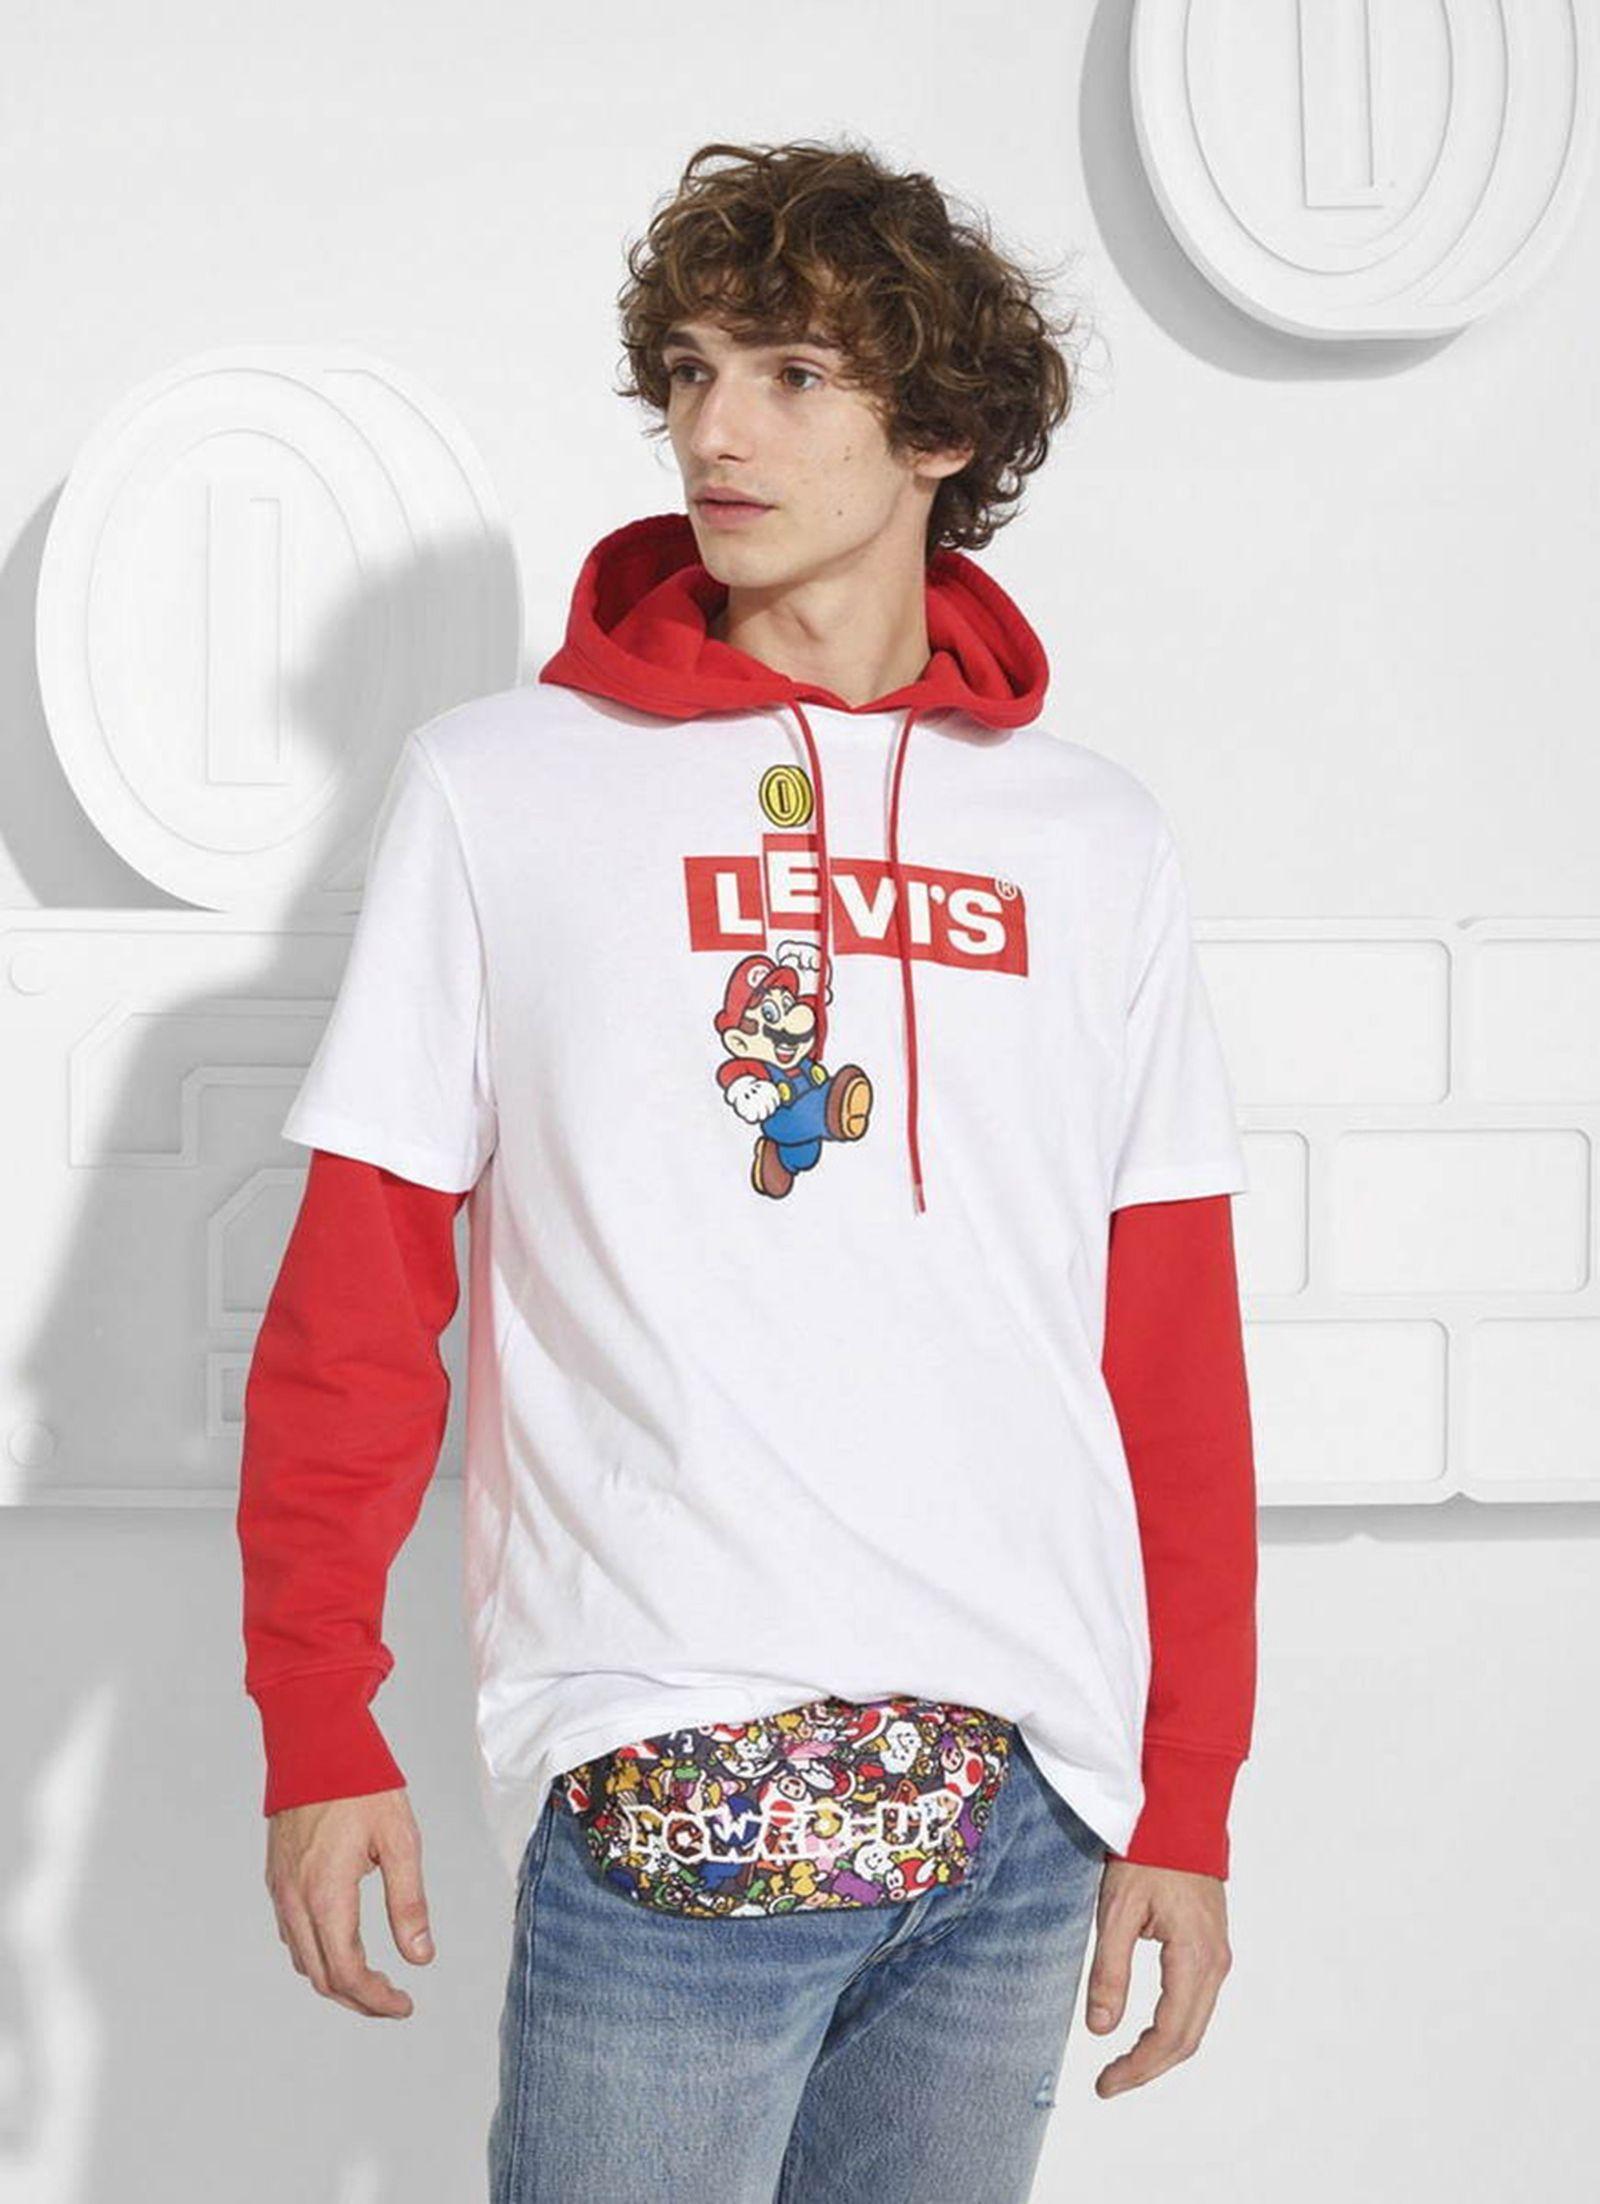 Levi's Nintendo Super Mario Collection